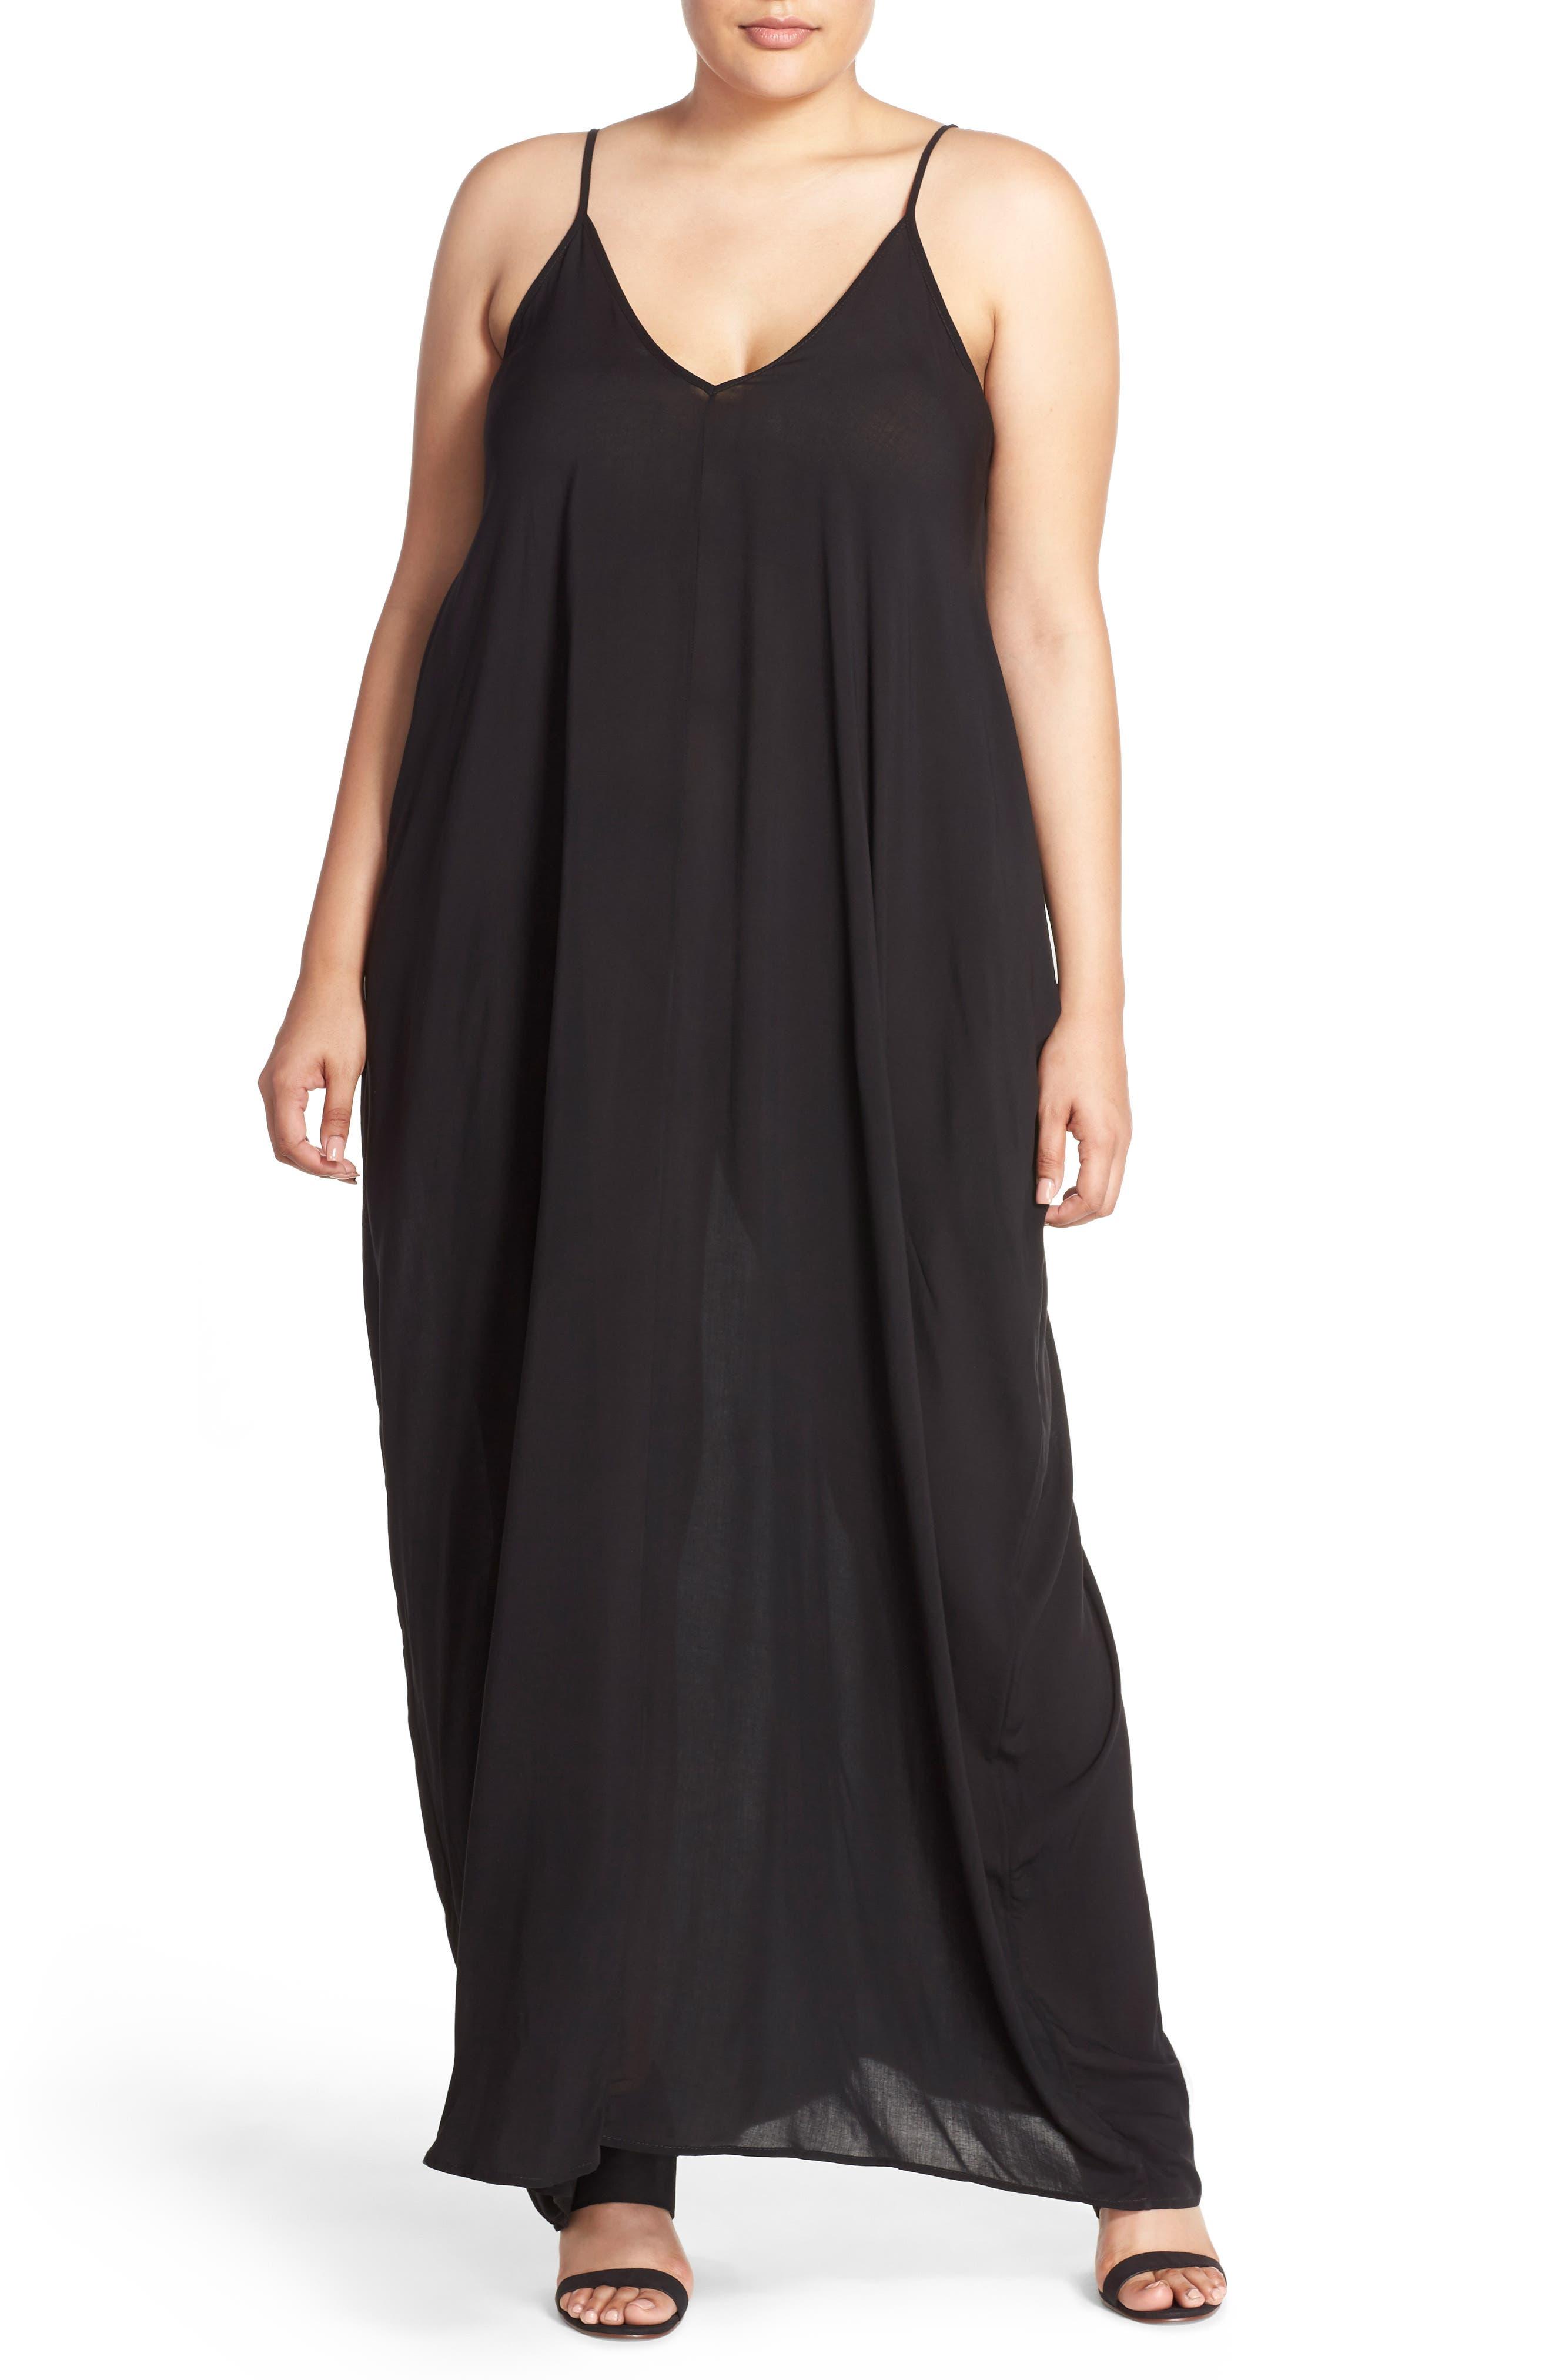 ELAN Cover-Up Maxi Dress in Black